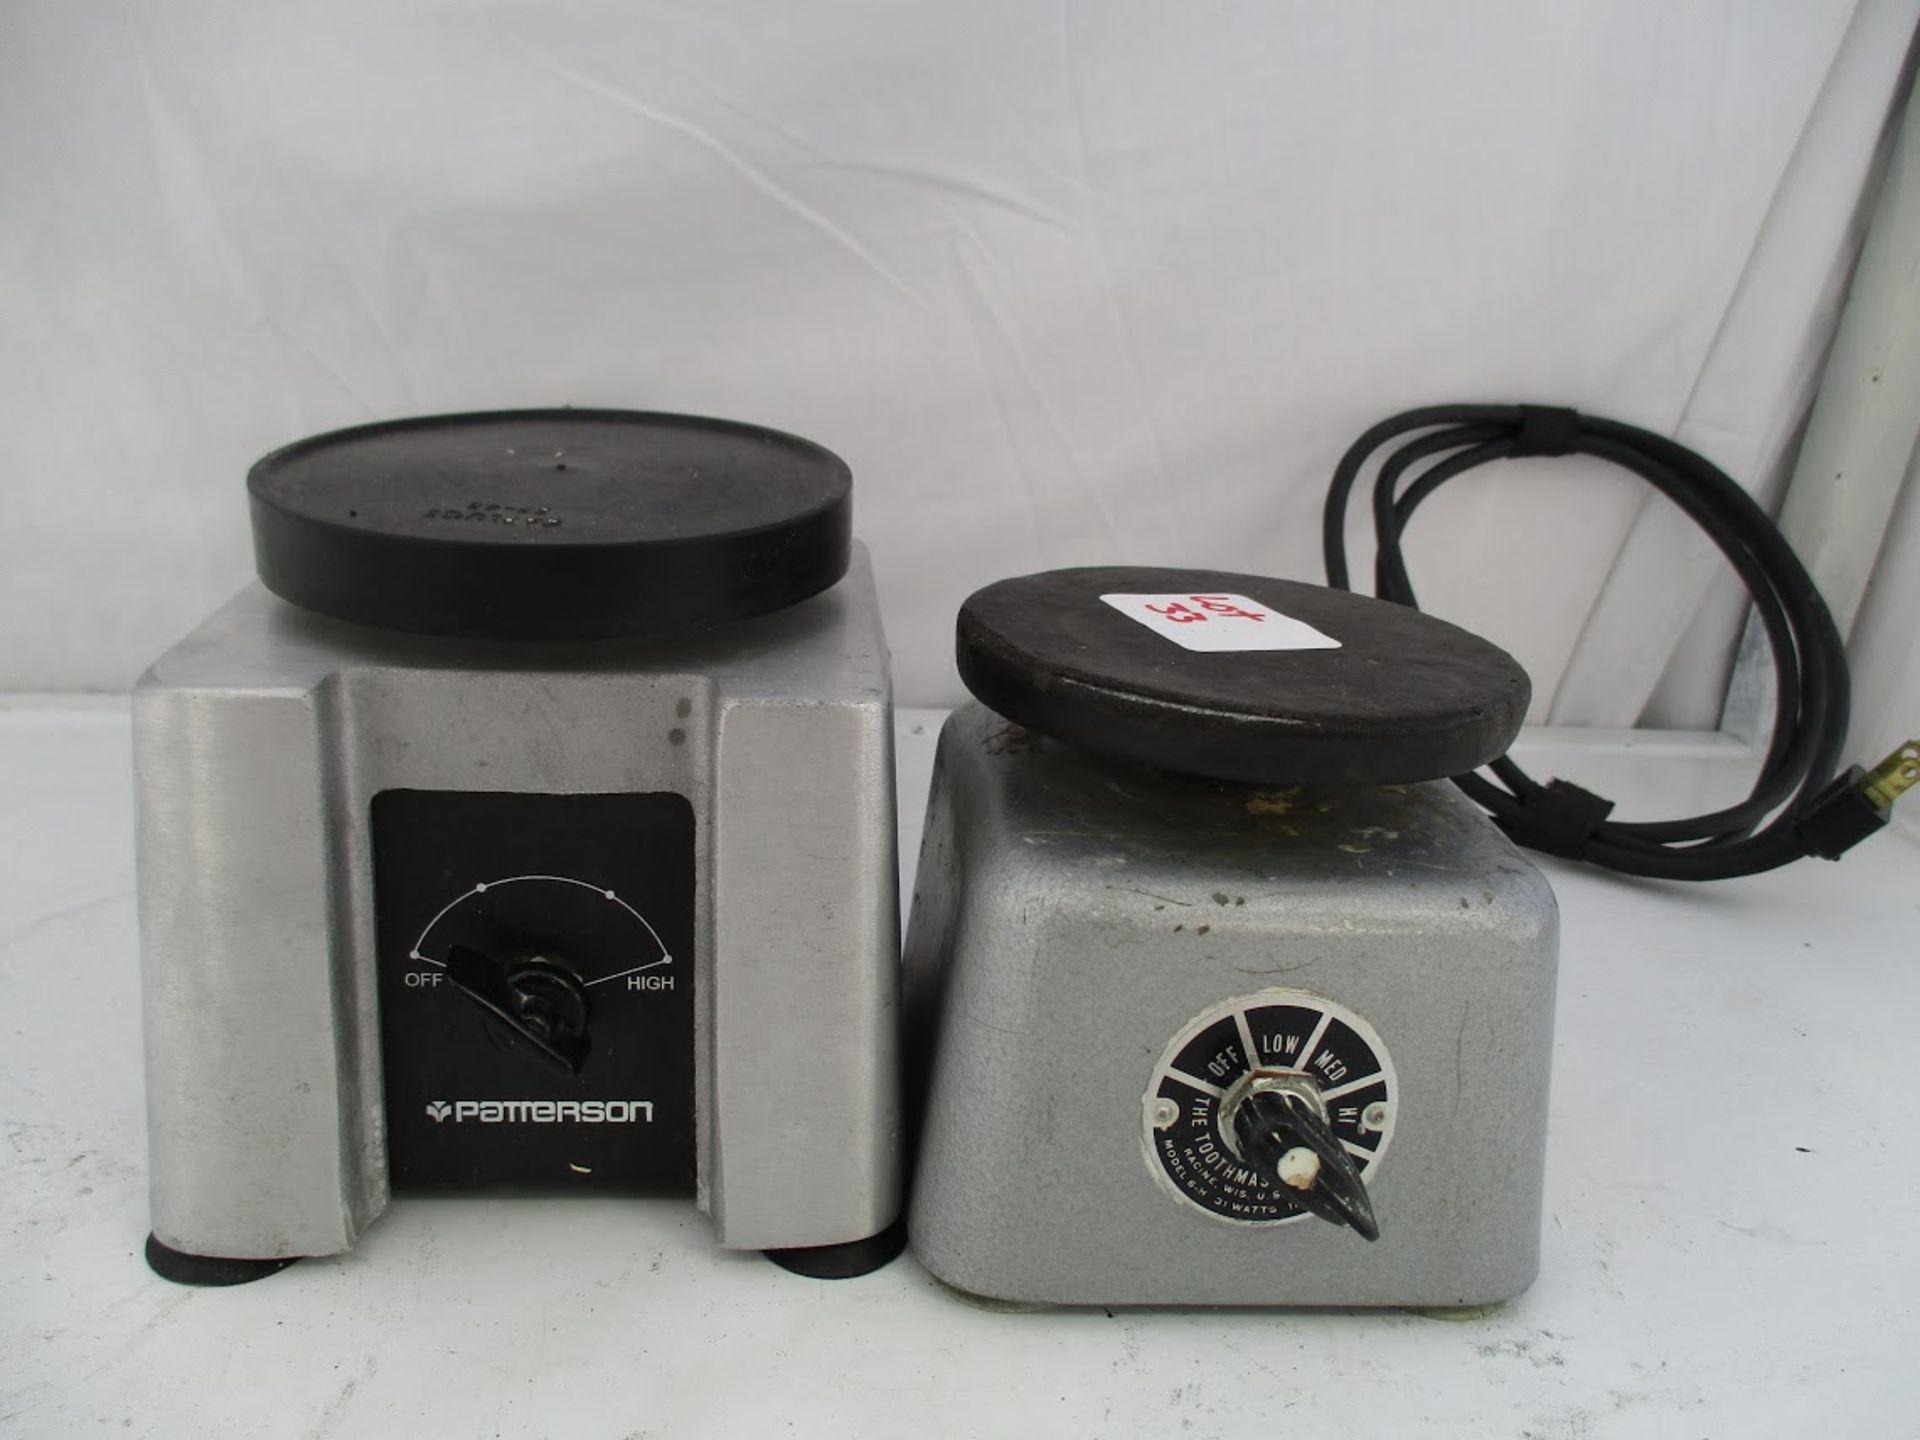 Patterson Dental Vibrator 150W 120V plus Toothmaster Model 6H Plaster Vibrator 31 watts, 115V